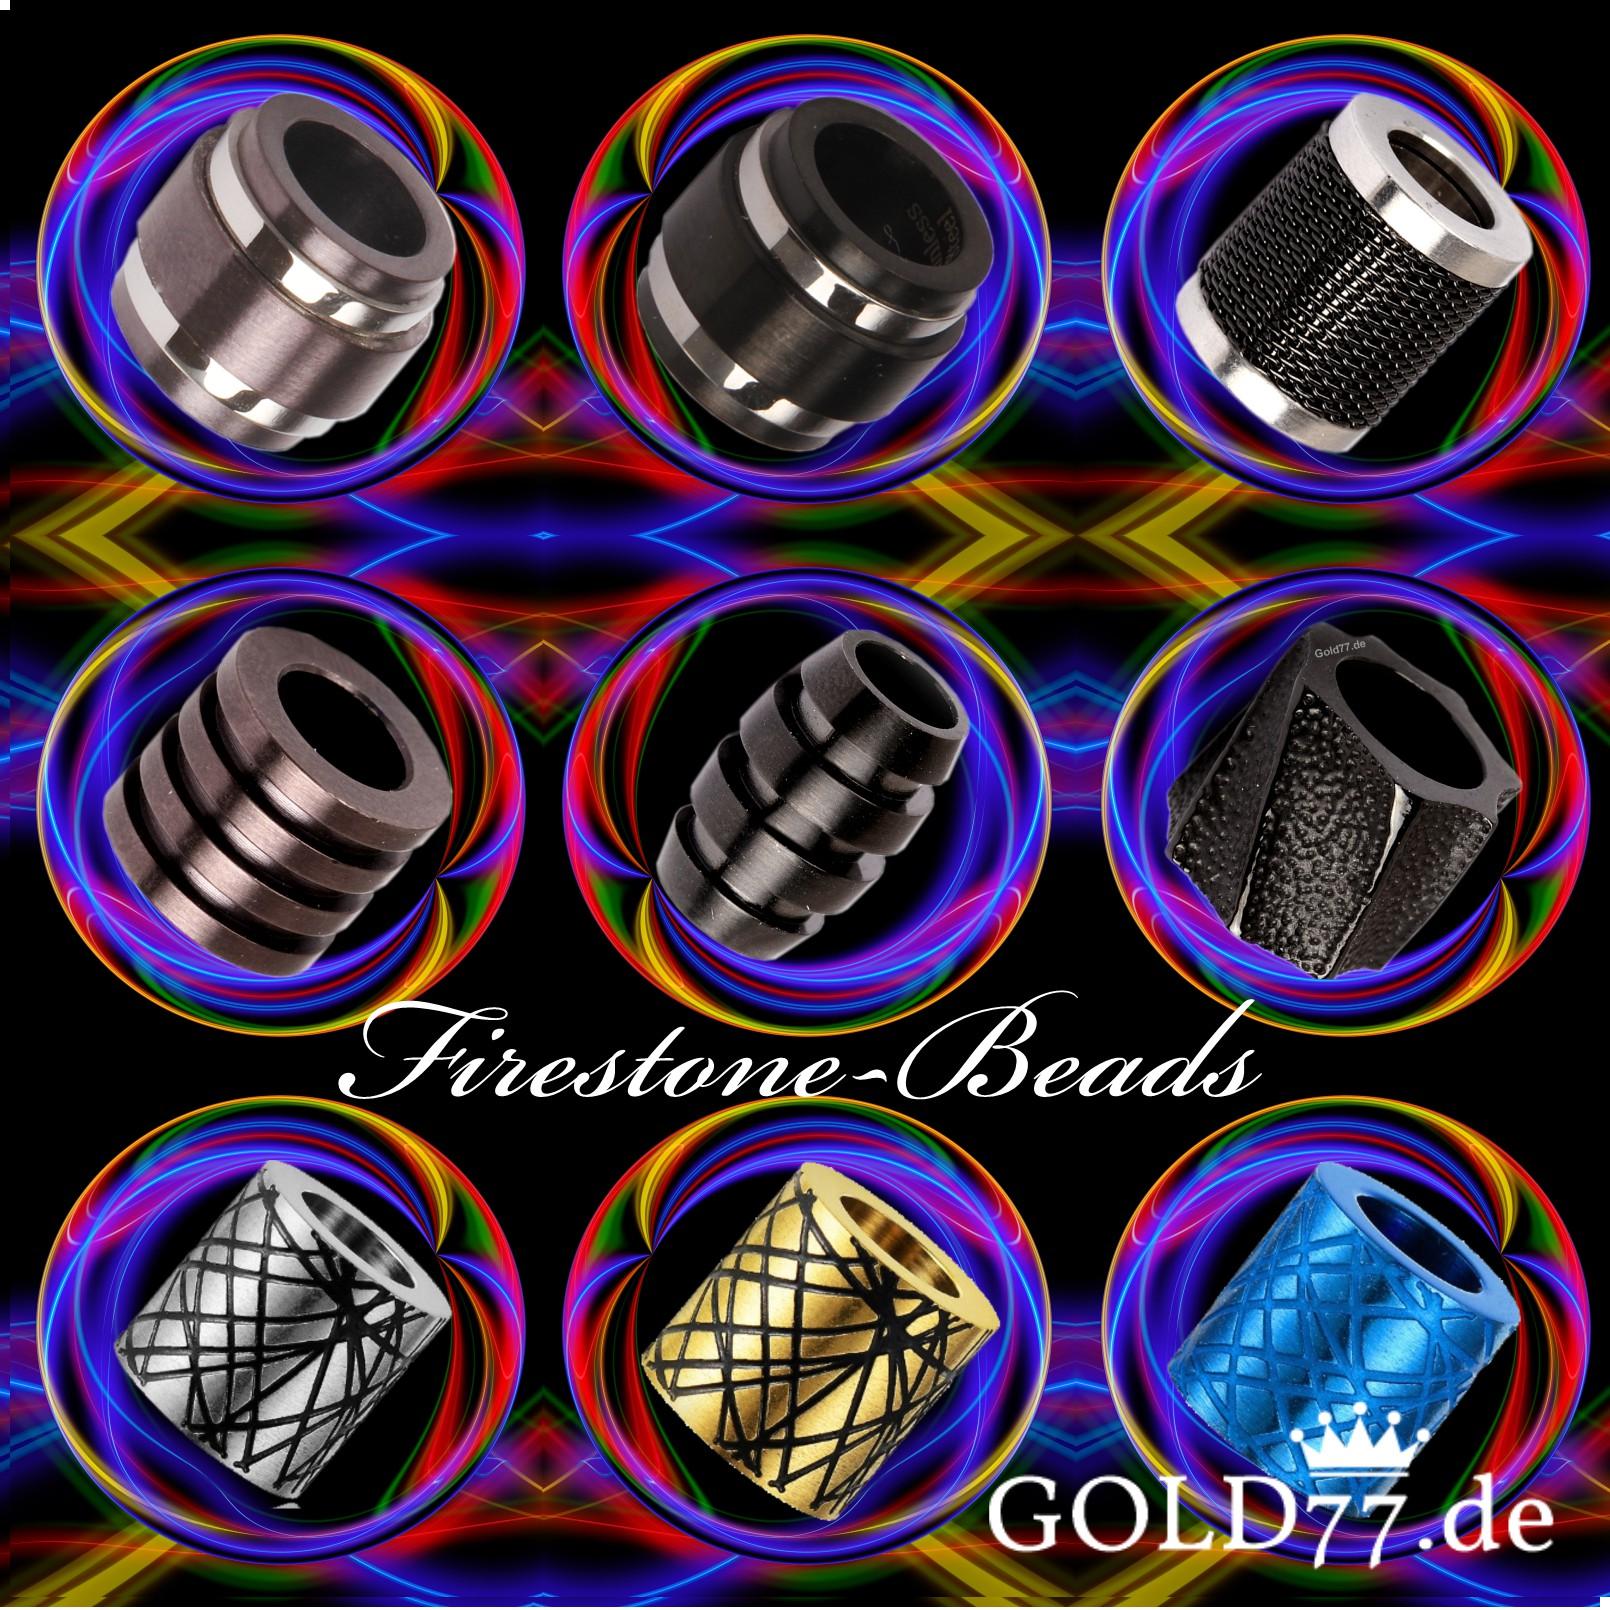 Firestone-Beads